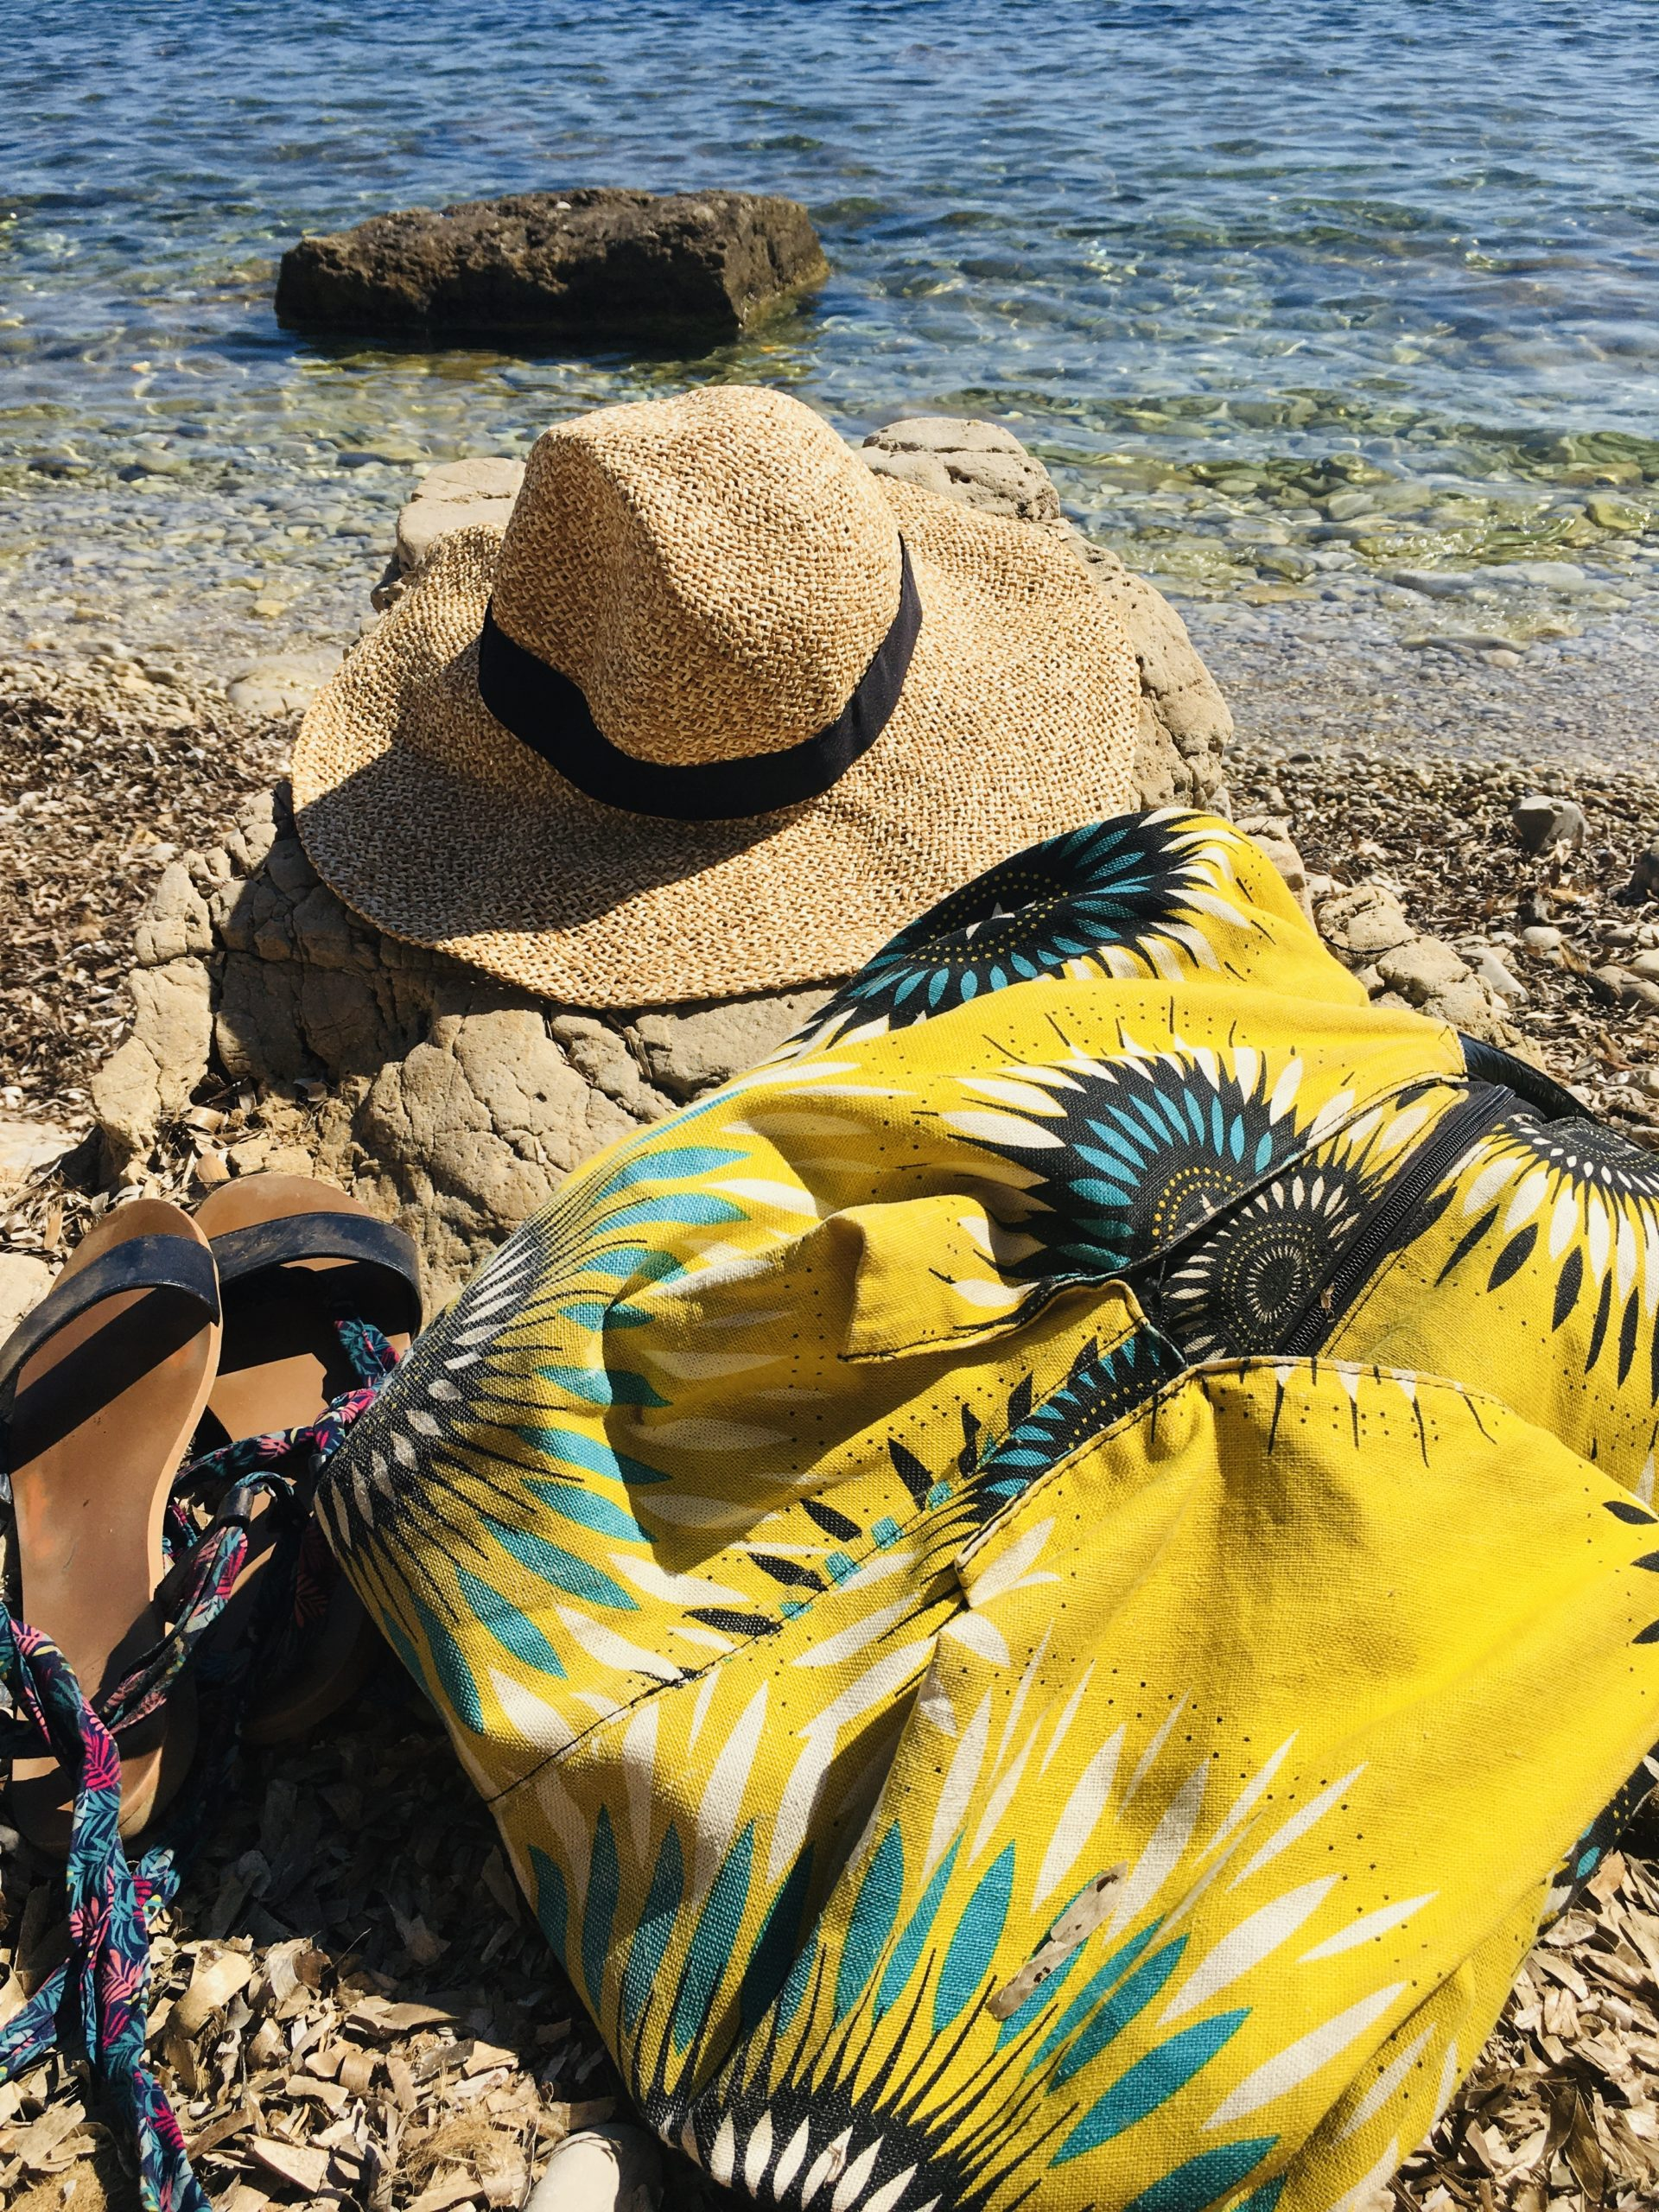 Walt Whitman - On The Beach At NIght Alone